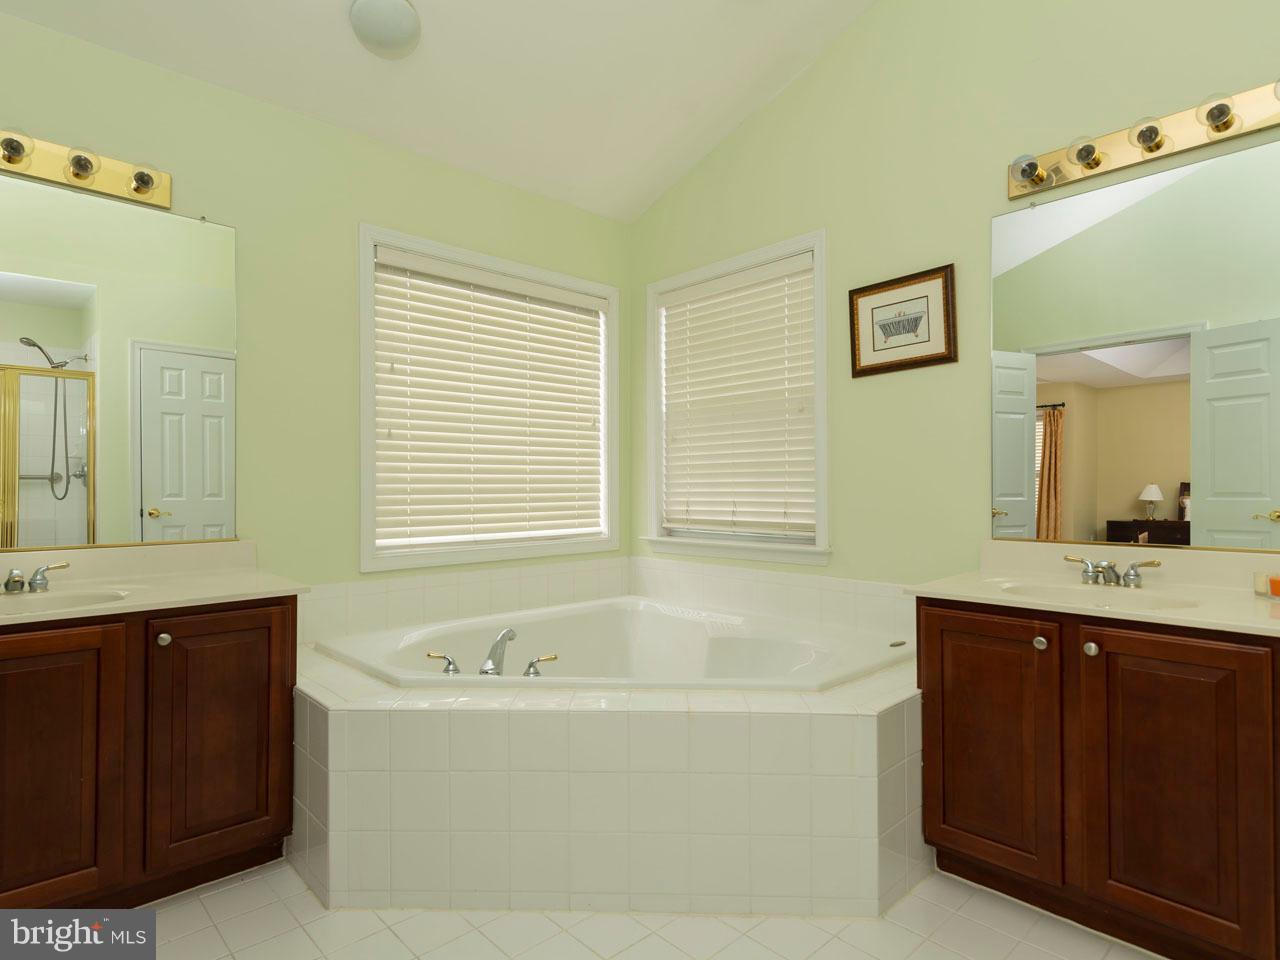 VAFX426100-301143652434-2021-09-05-14-39-03  |   | Chantilly Delaware Real Estate For Sale | MLS# Vafx426100  - Best of Northern Virginia